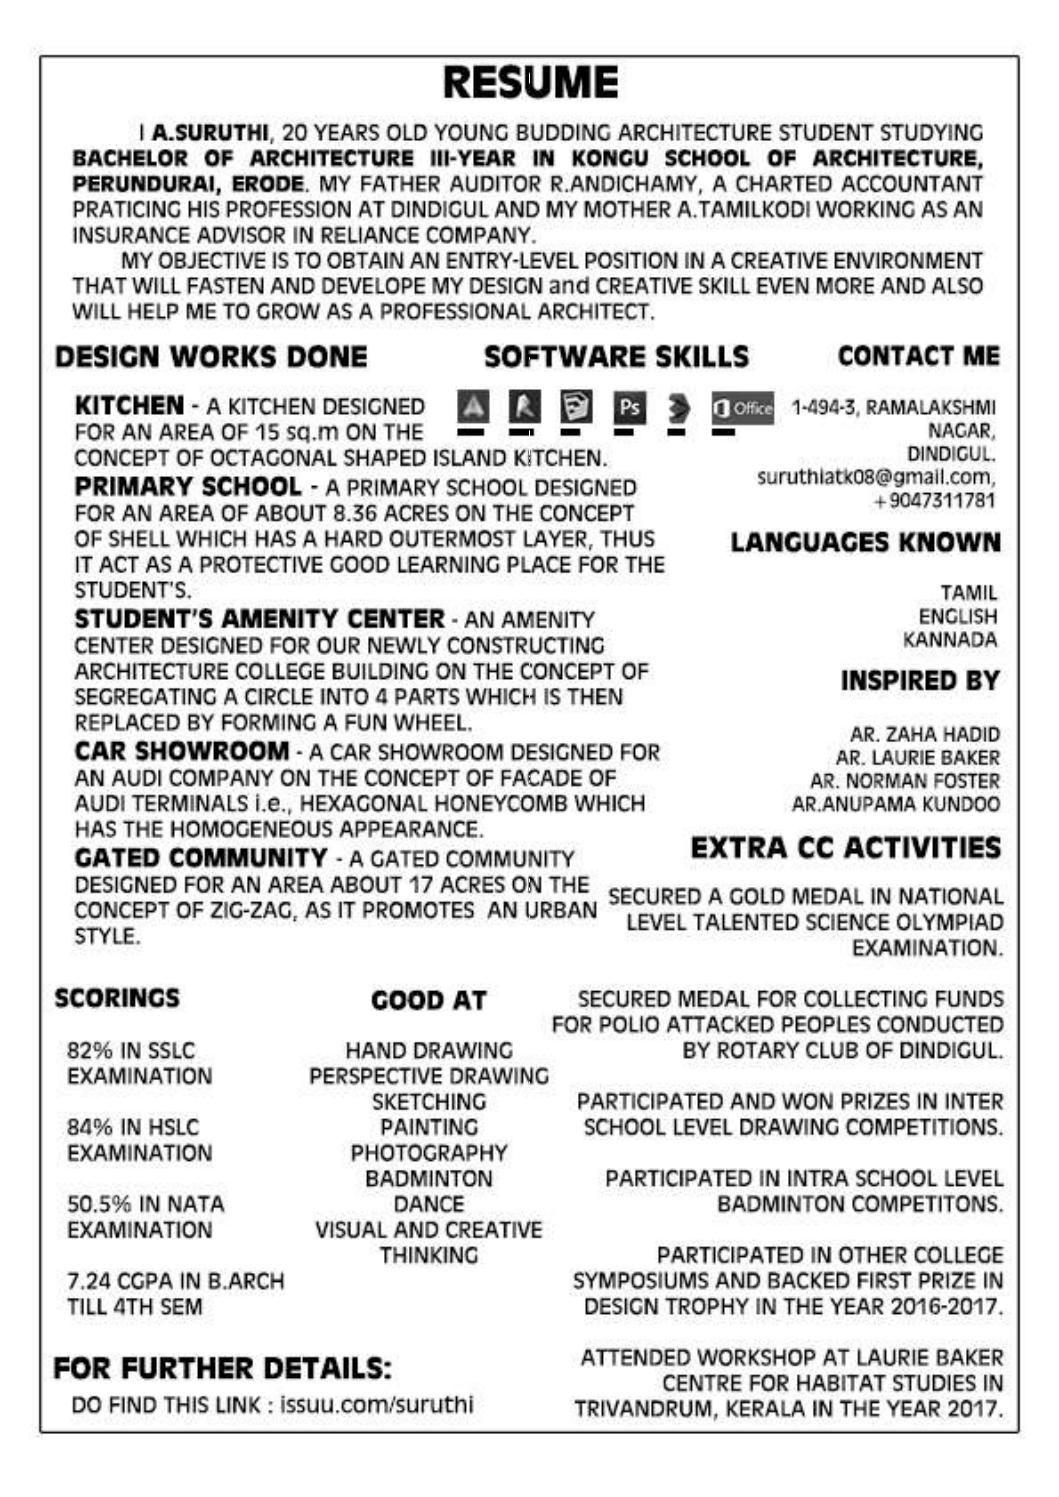 Suruthi's resume Resume, School architecture